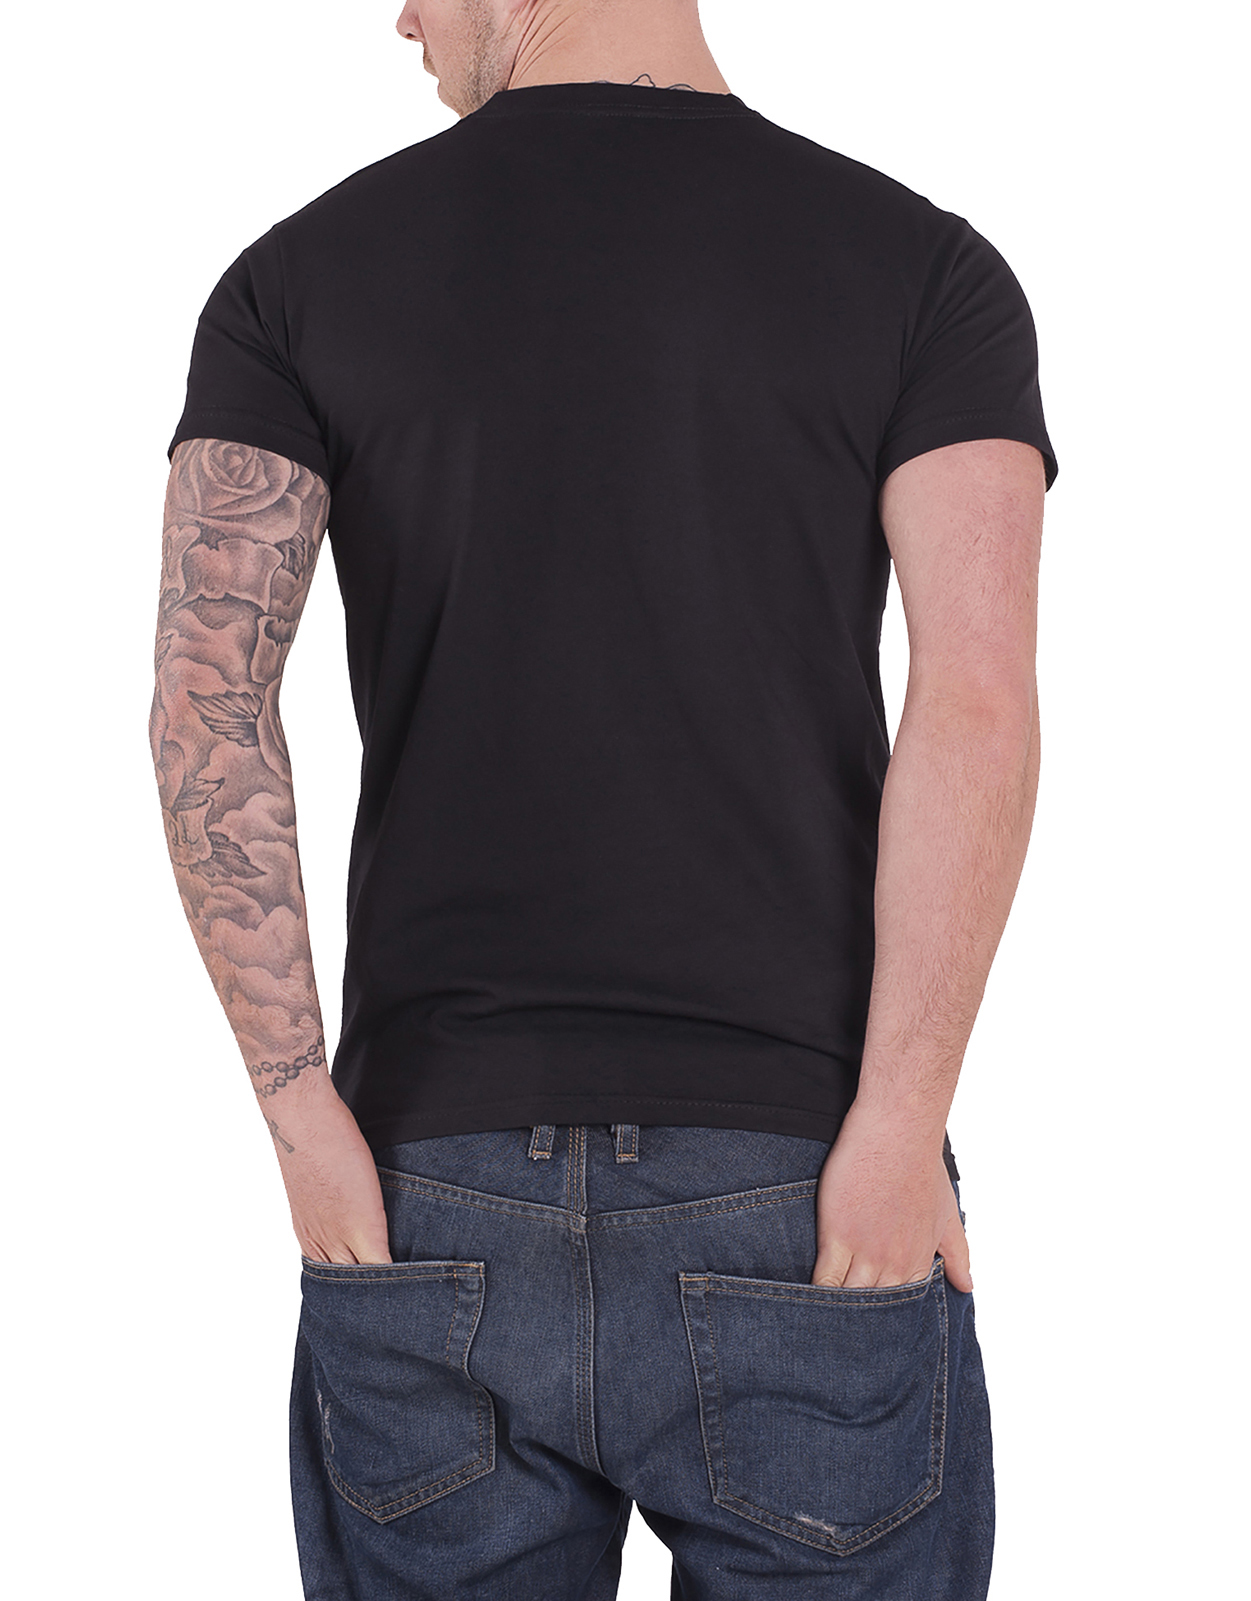 Motorhead-T-Shirt-Lemmy-RIP-England-warpig-clean-your-clock-official-new-mens Indexbild 65